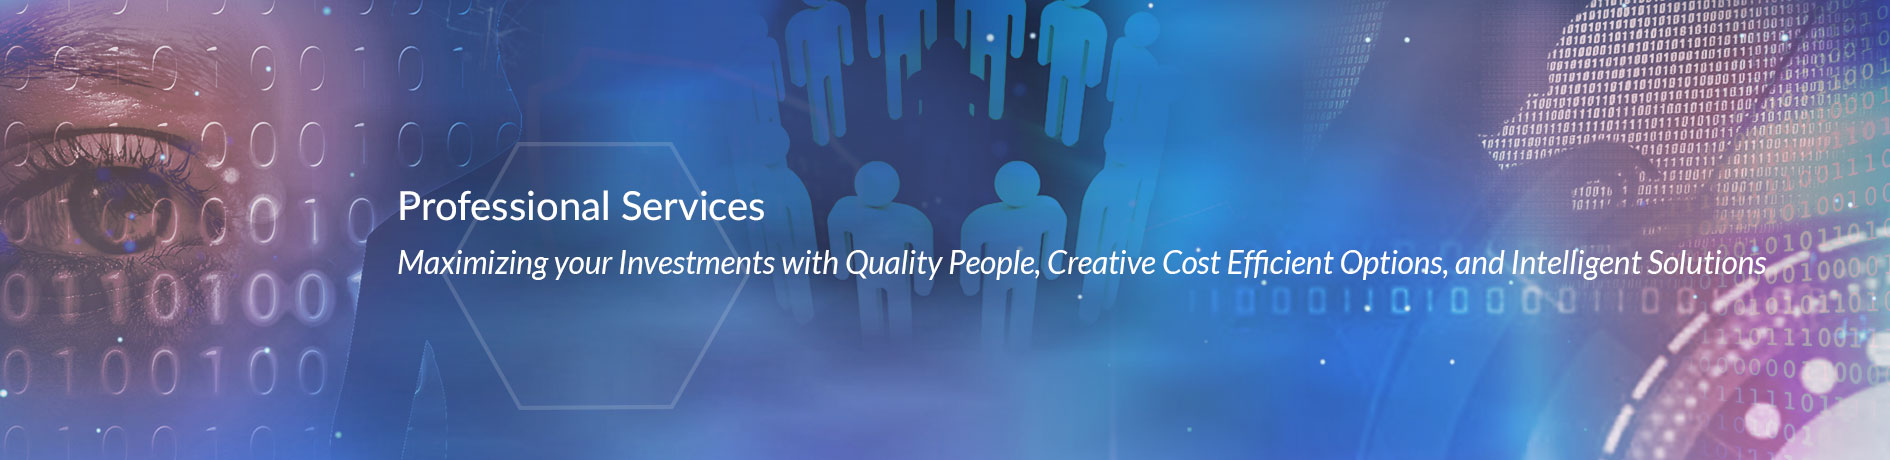 Gurucul-Professional Services